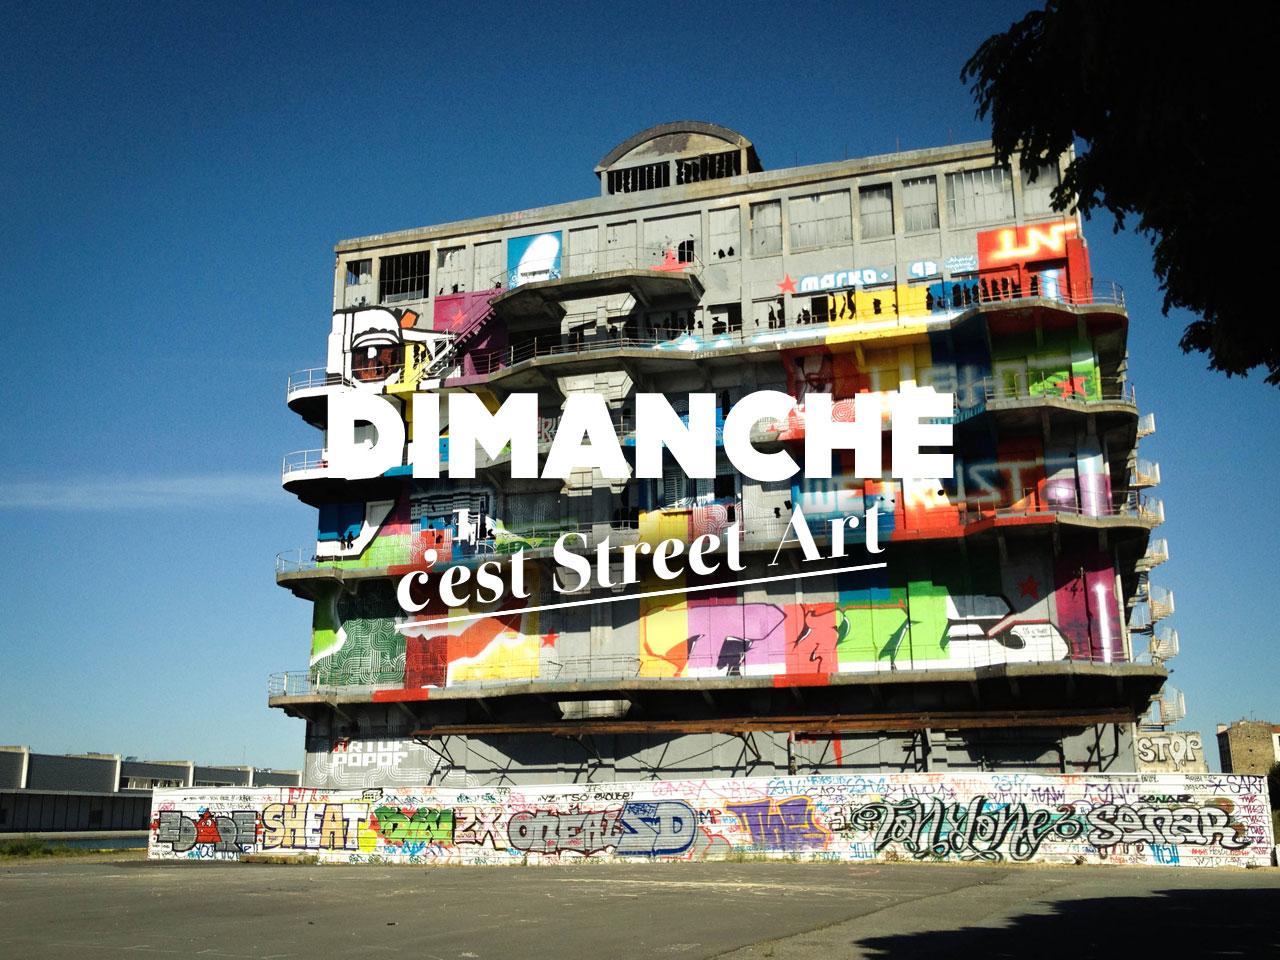 http://erreur14.com/wp-content/uploads/2012/09/dimanche_street.jpg